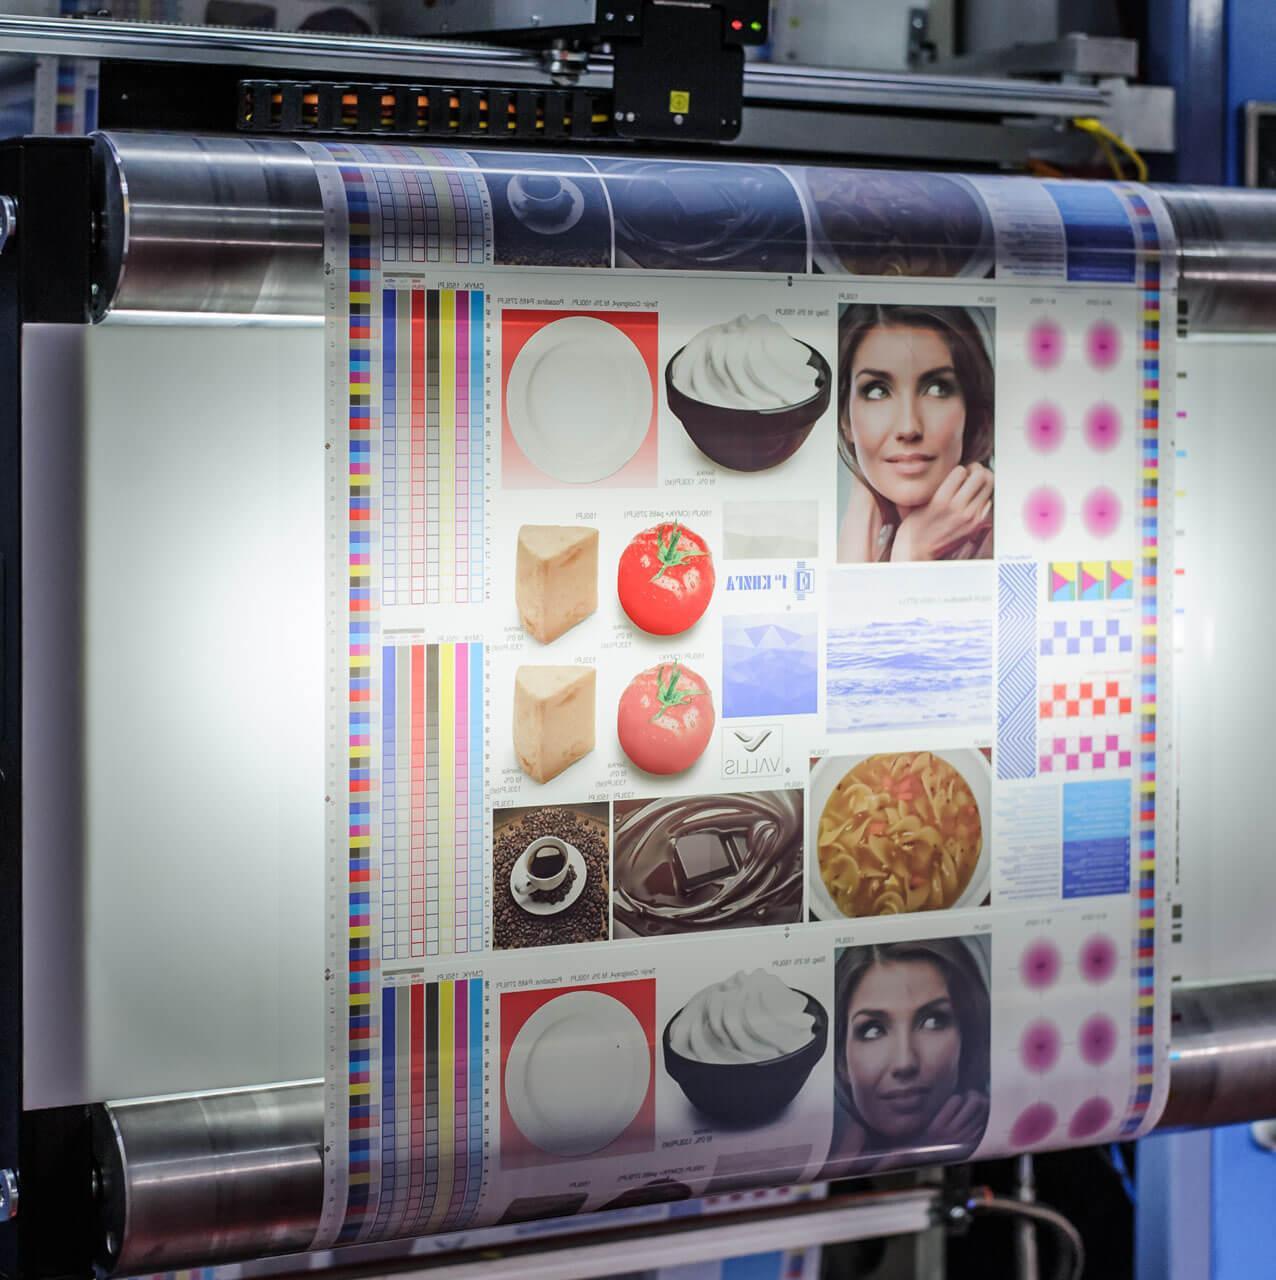 flexo-printing-machine-S10-vallis-25